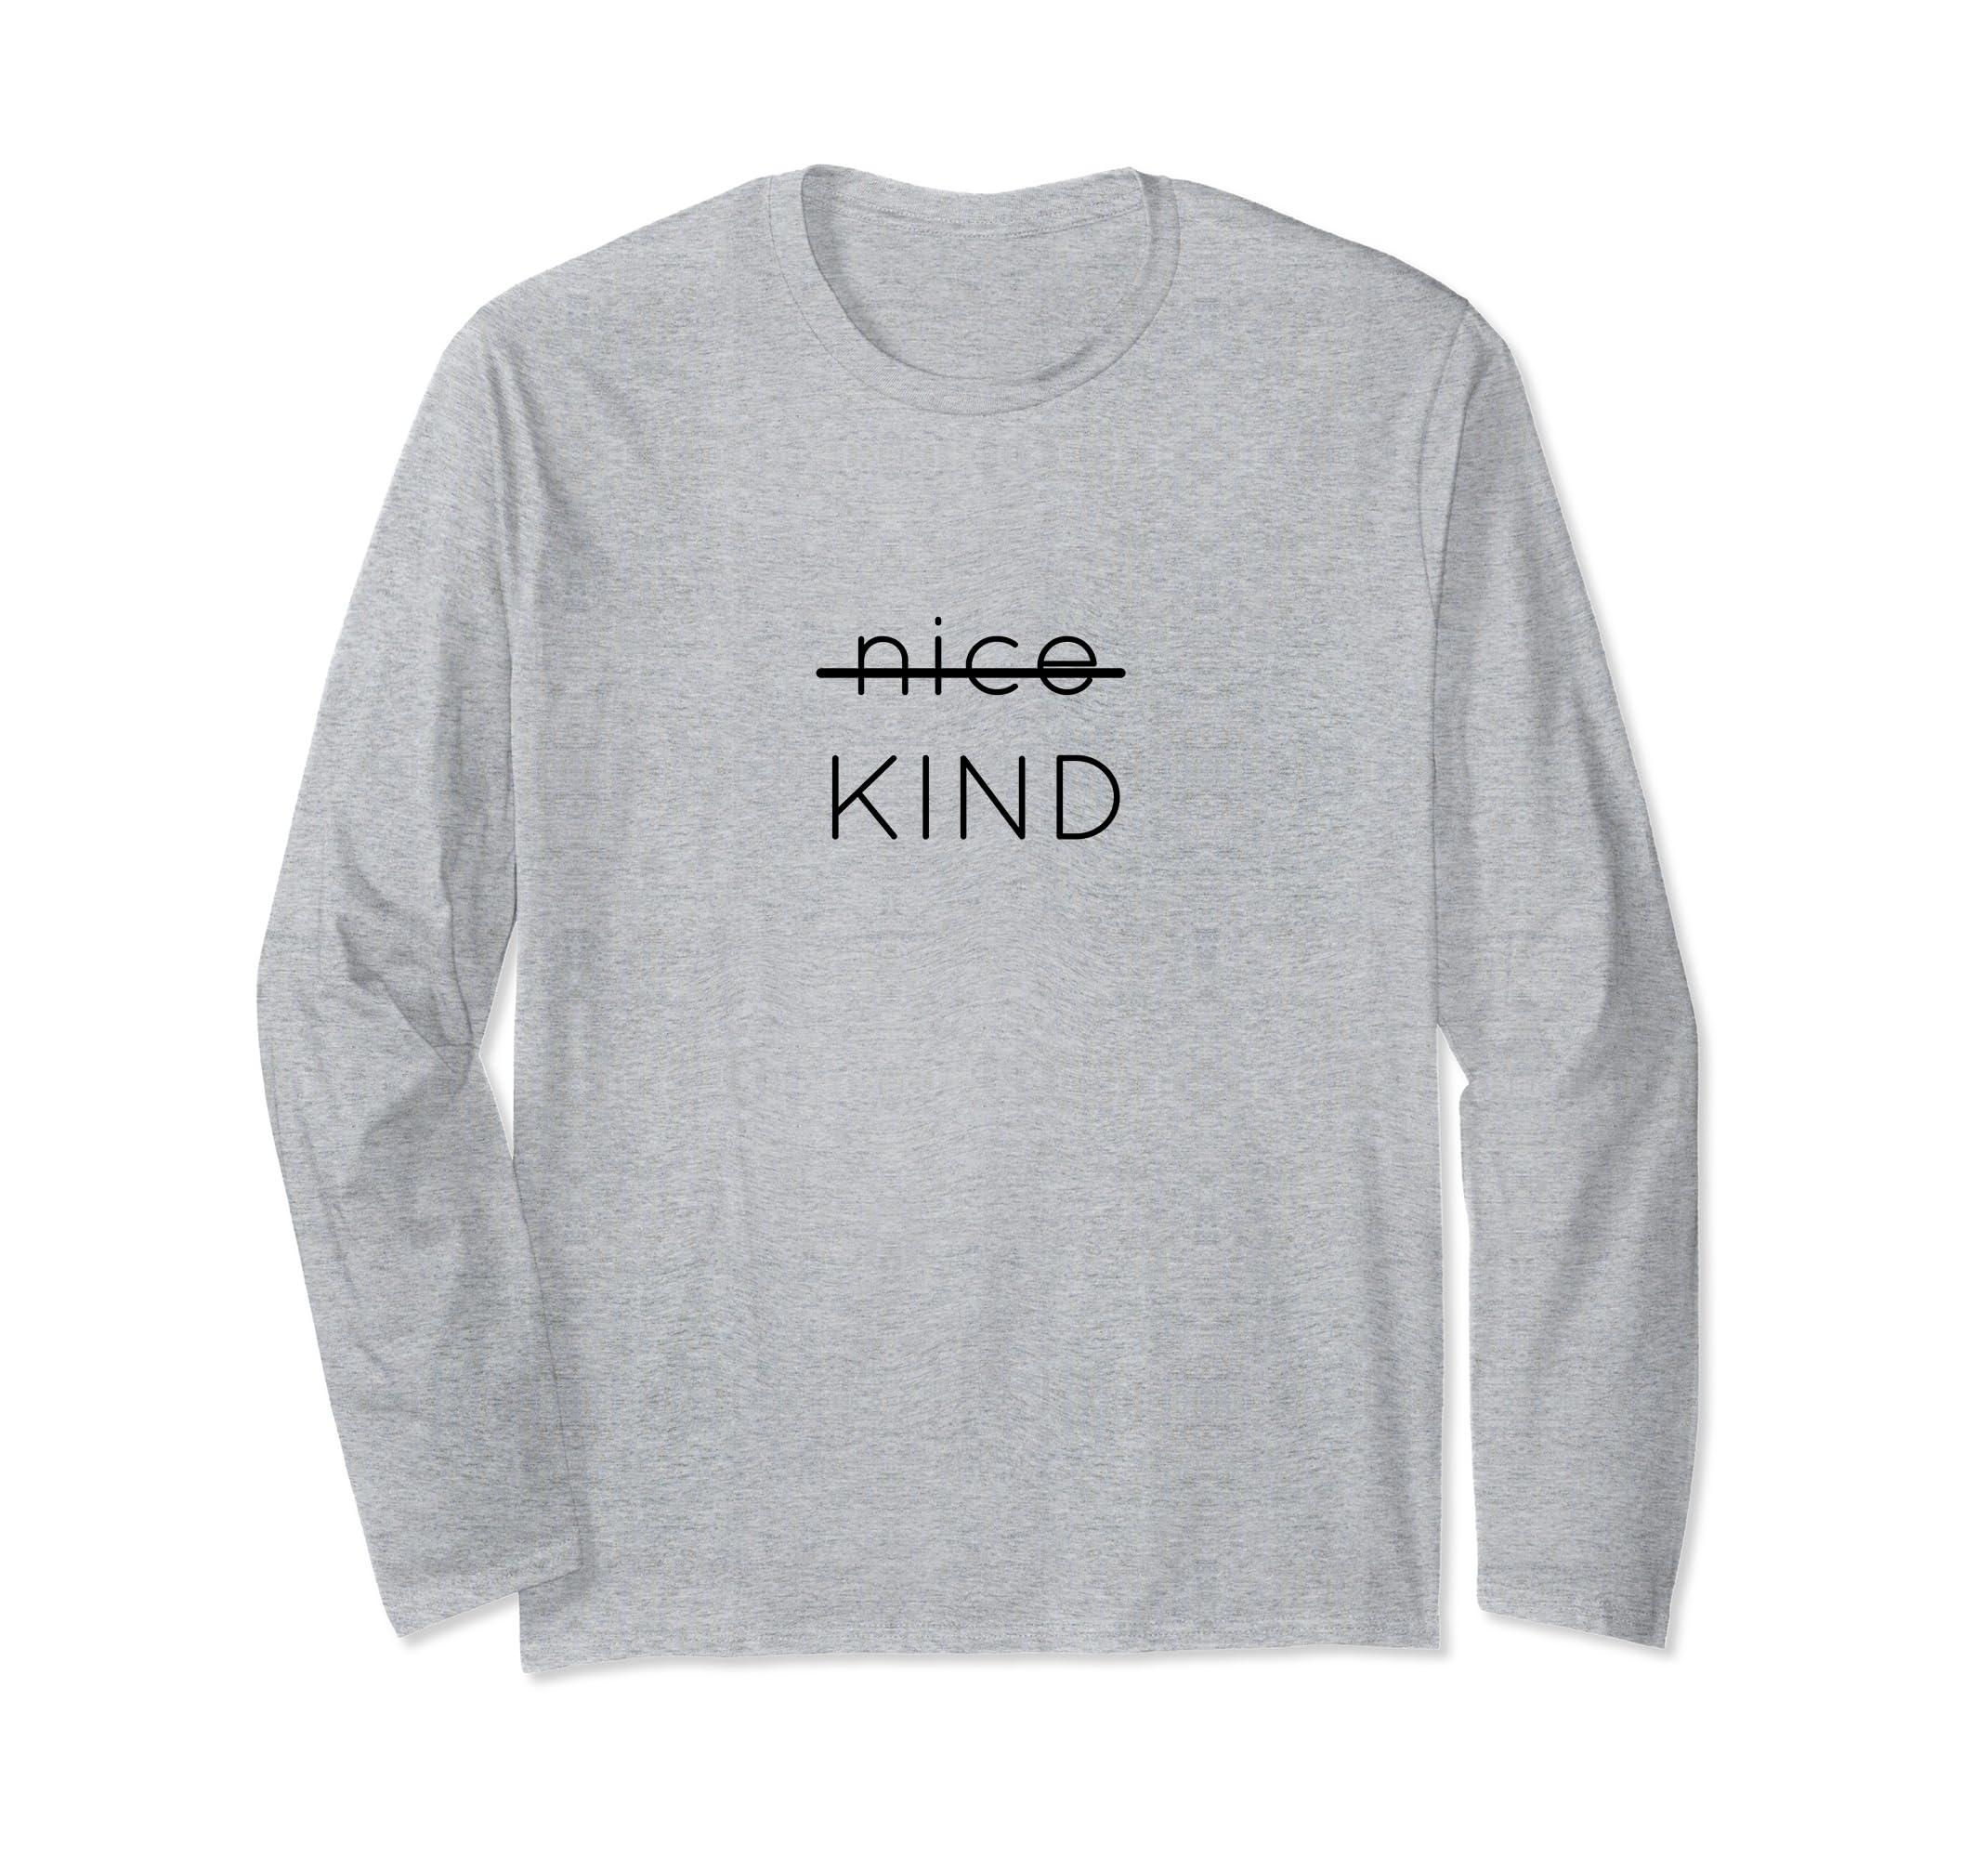 Not Nice. KIND. Mocha Tribe Shirt Autism Education/Awareness-4LVS